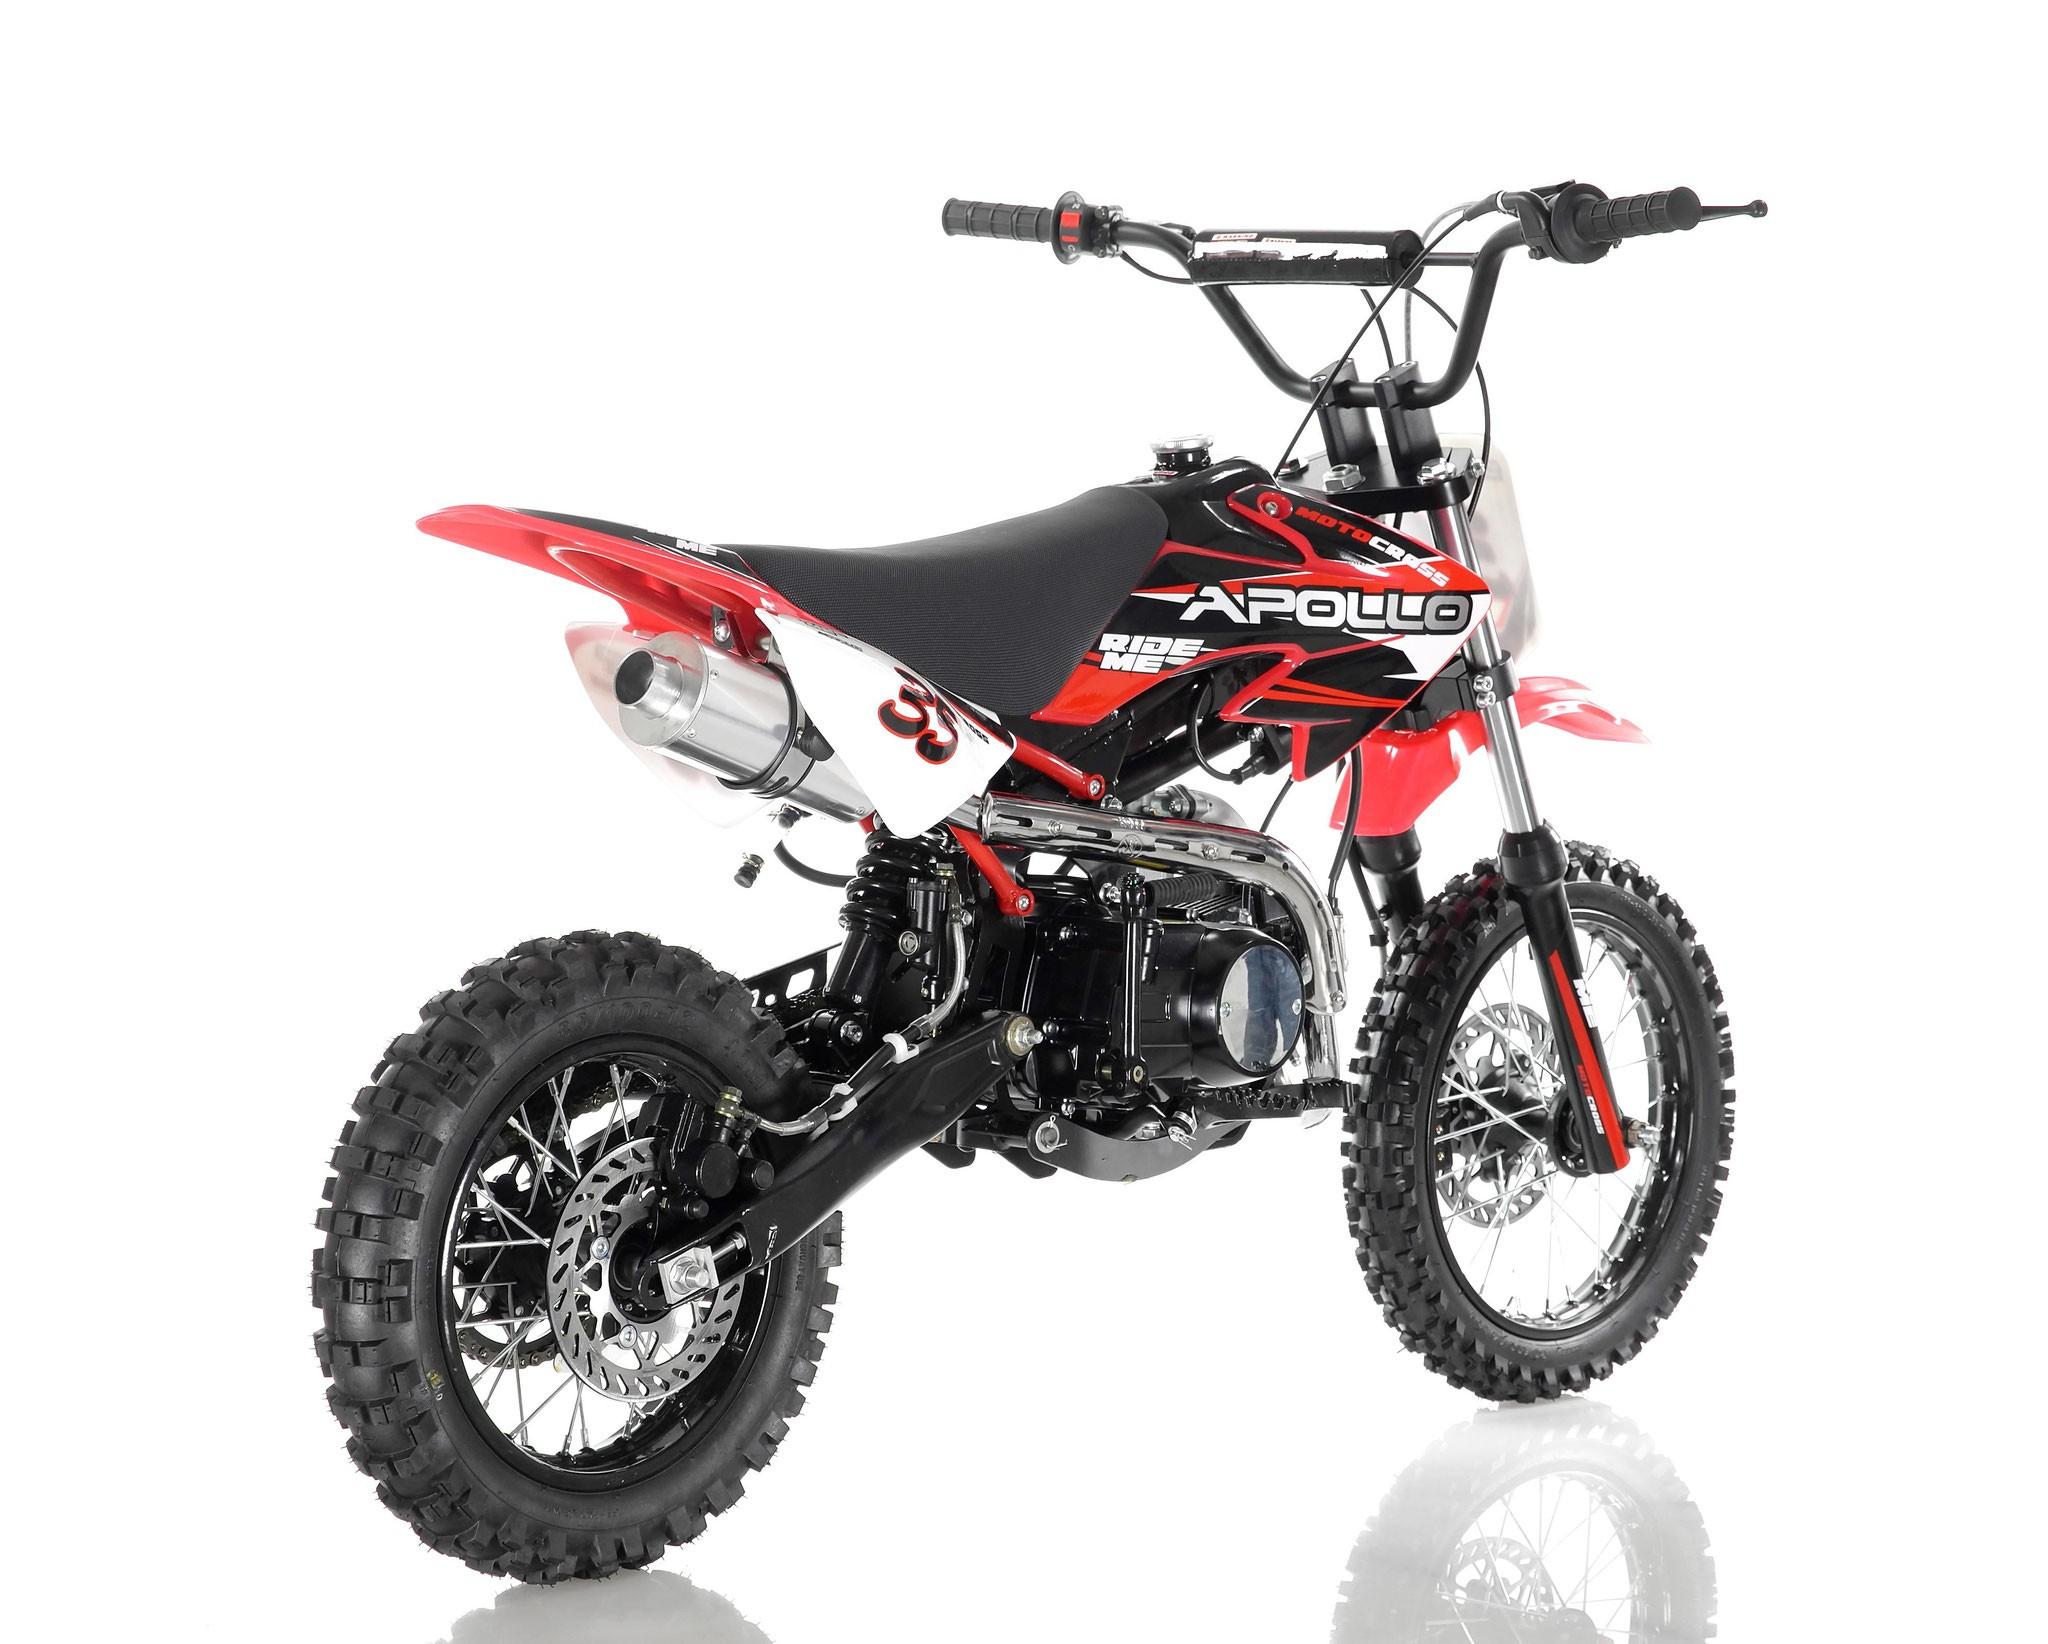 apollo 125cc db 35 dirt bike. Black Bedroom Furniture Sets. Home Design Ideas